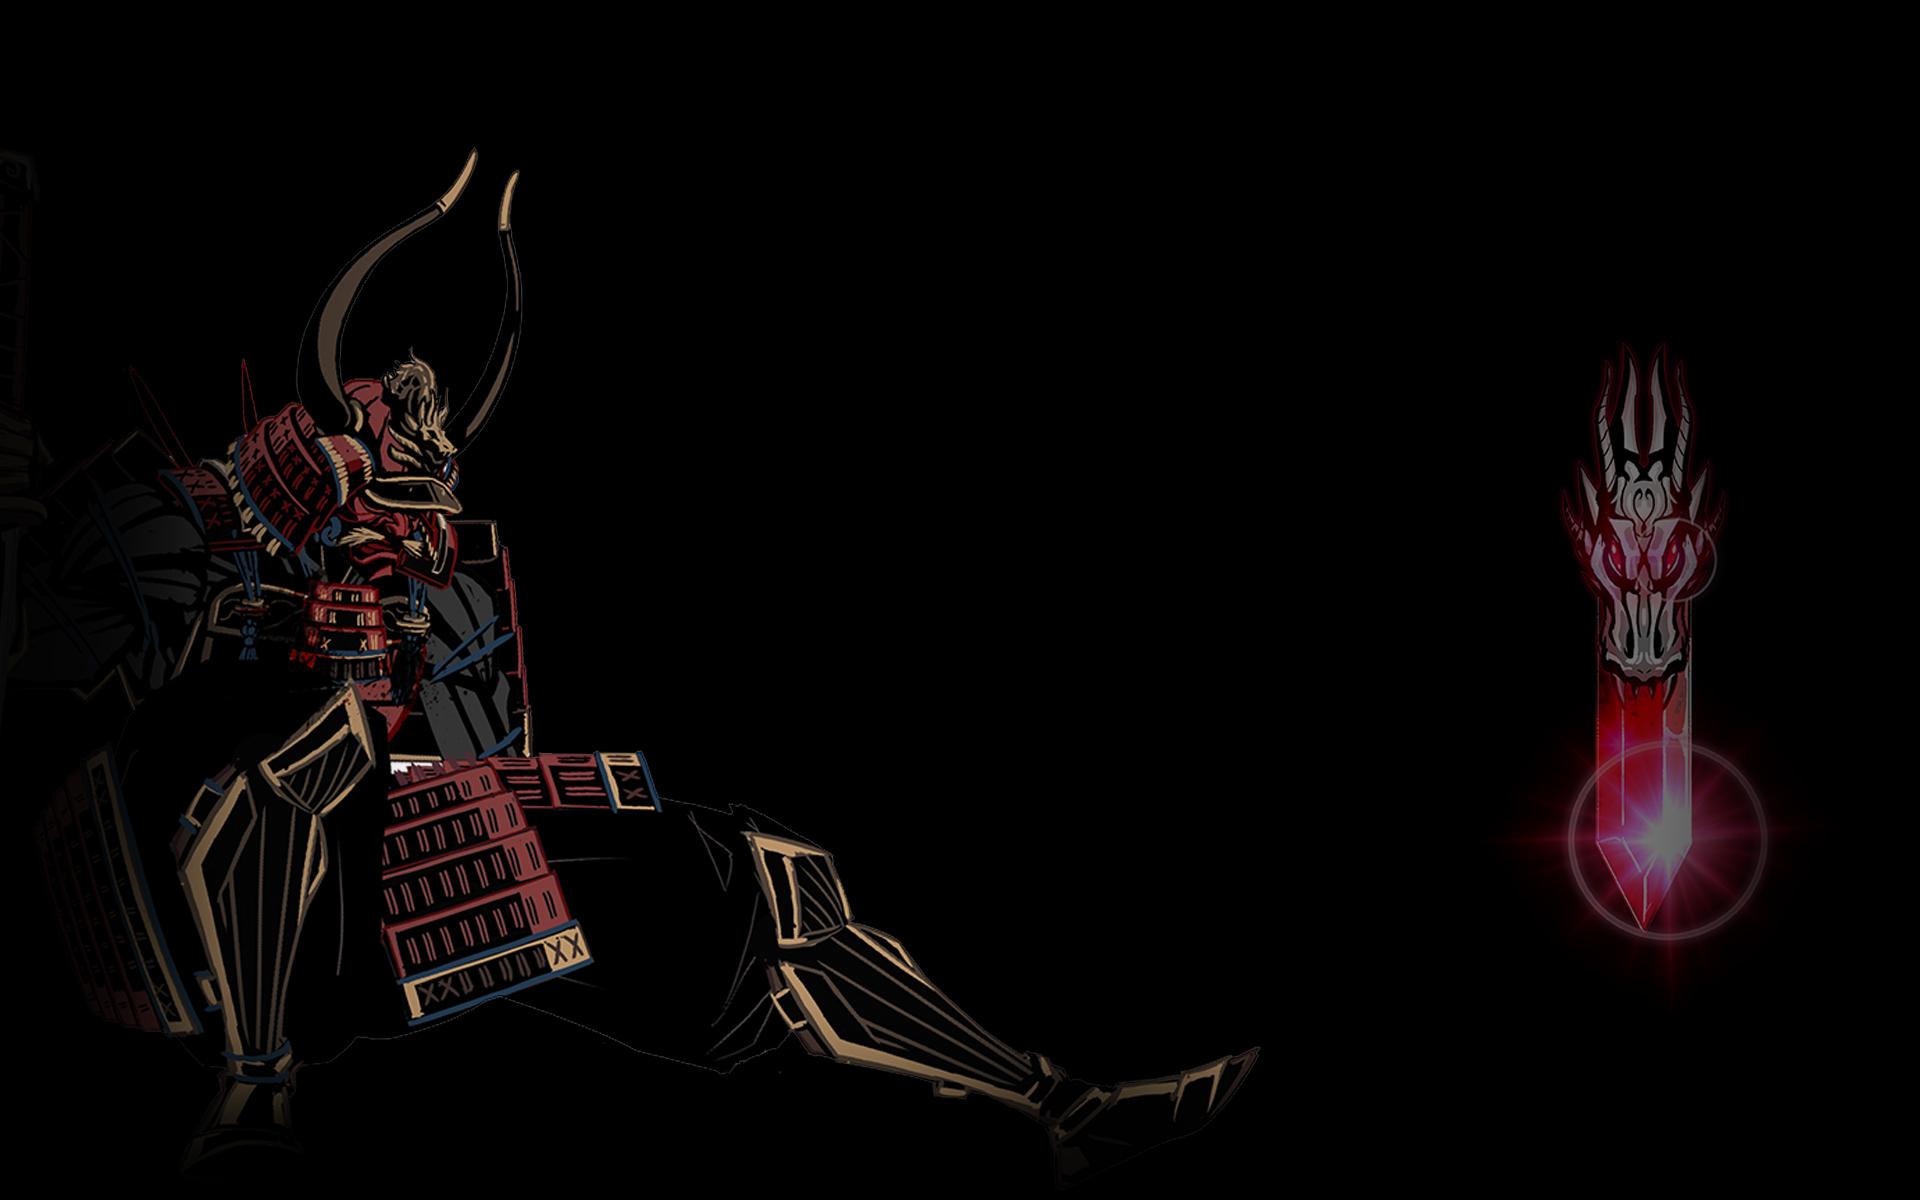 Image onikira demon killer background daimyog steam trading onikira demon killer background daimyog voltagebd Images